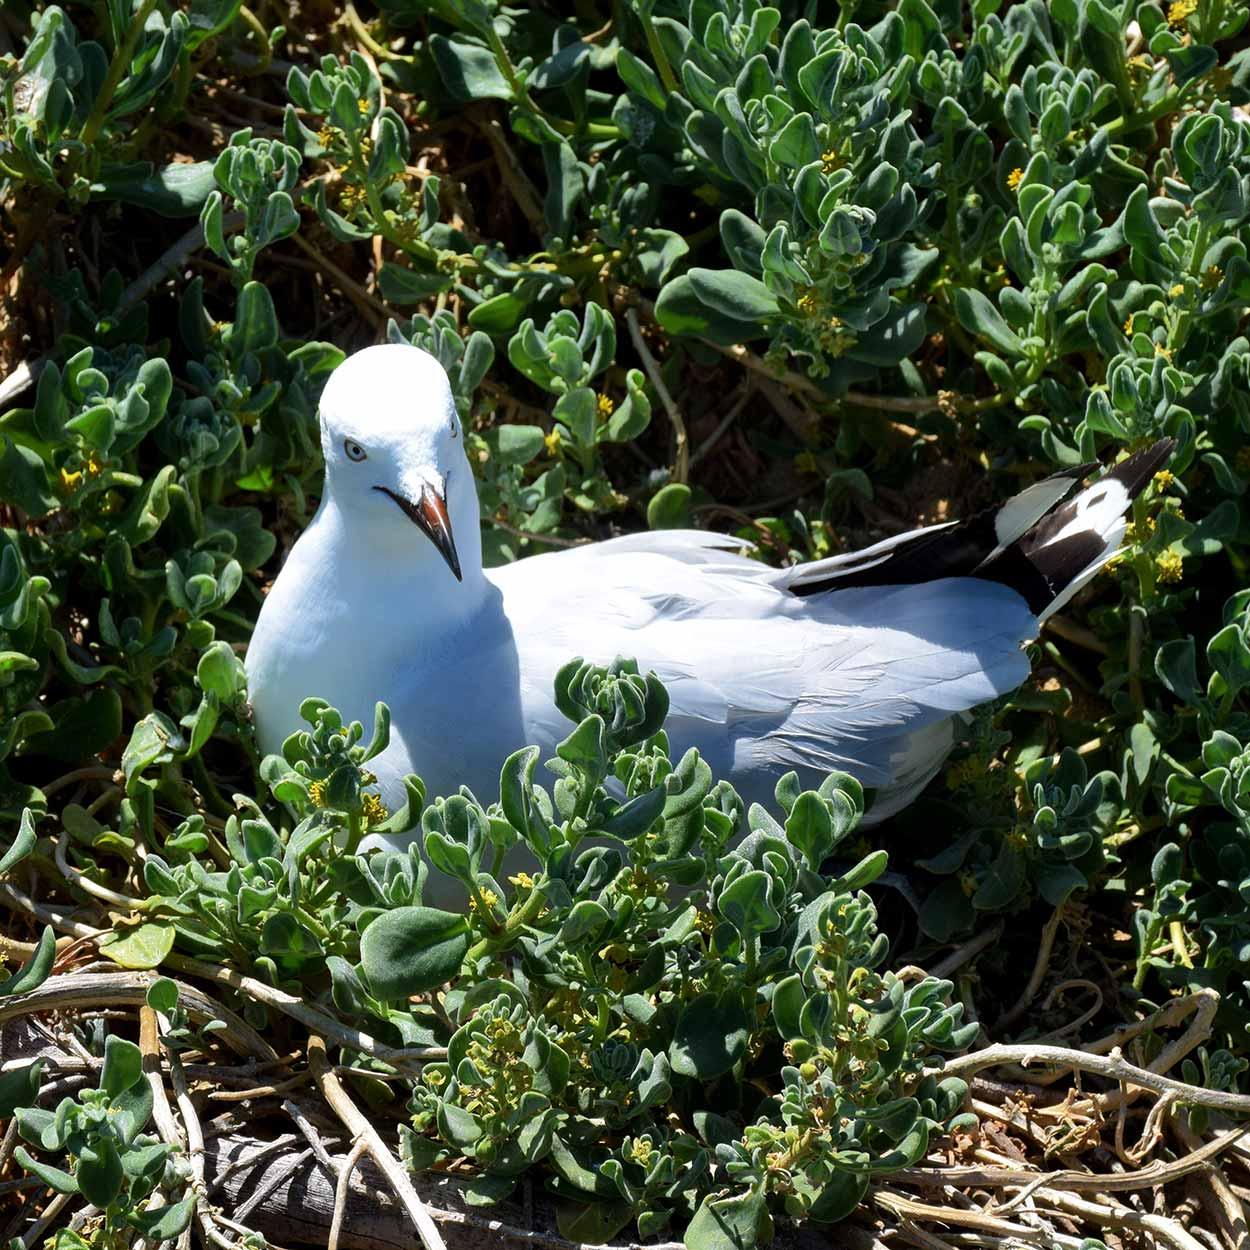 Nesting seagull, Penguin Island, Perth, Western Australia